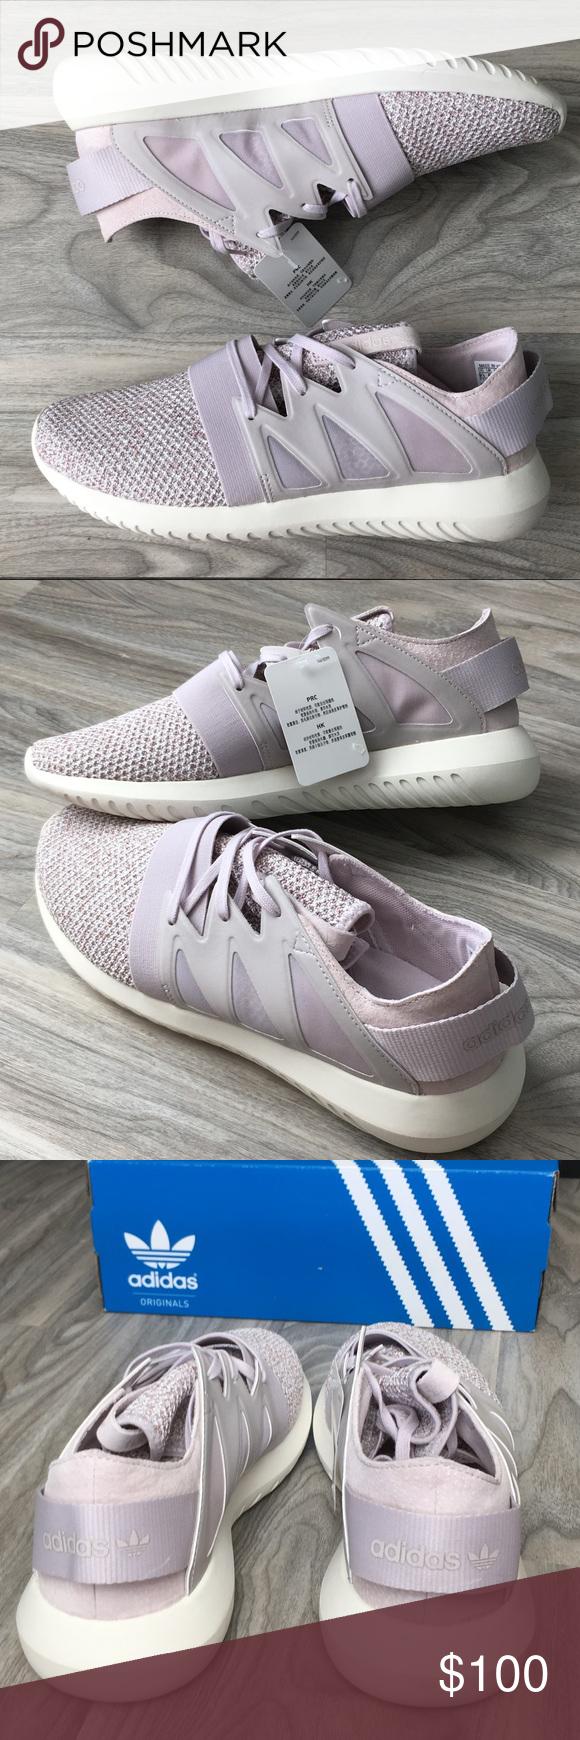 adidas icepurple tubulare donne nwt scarpe le scarpe